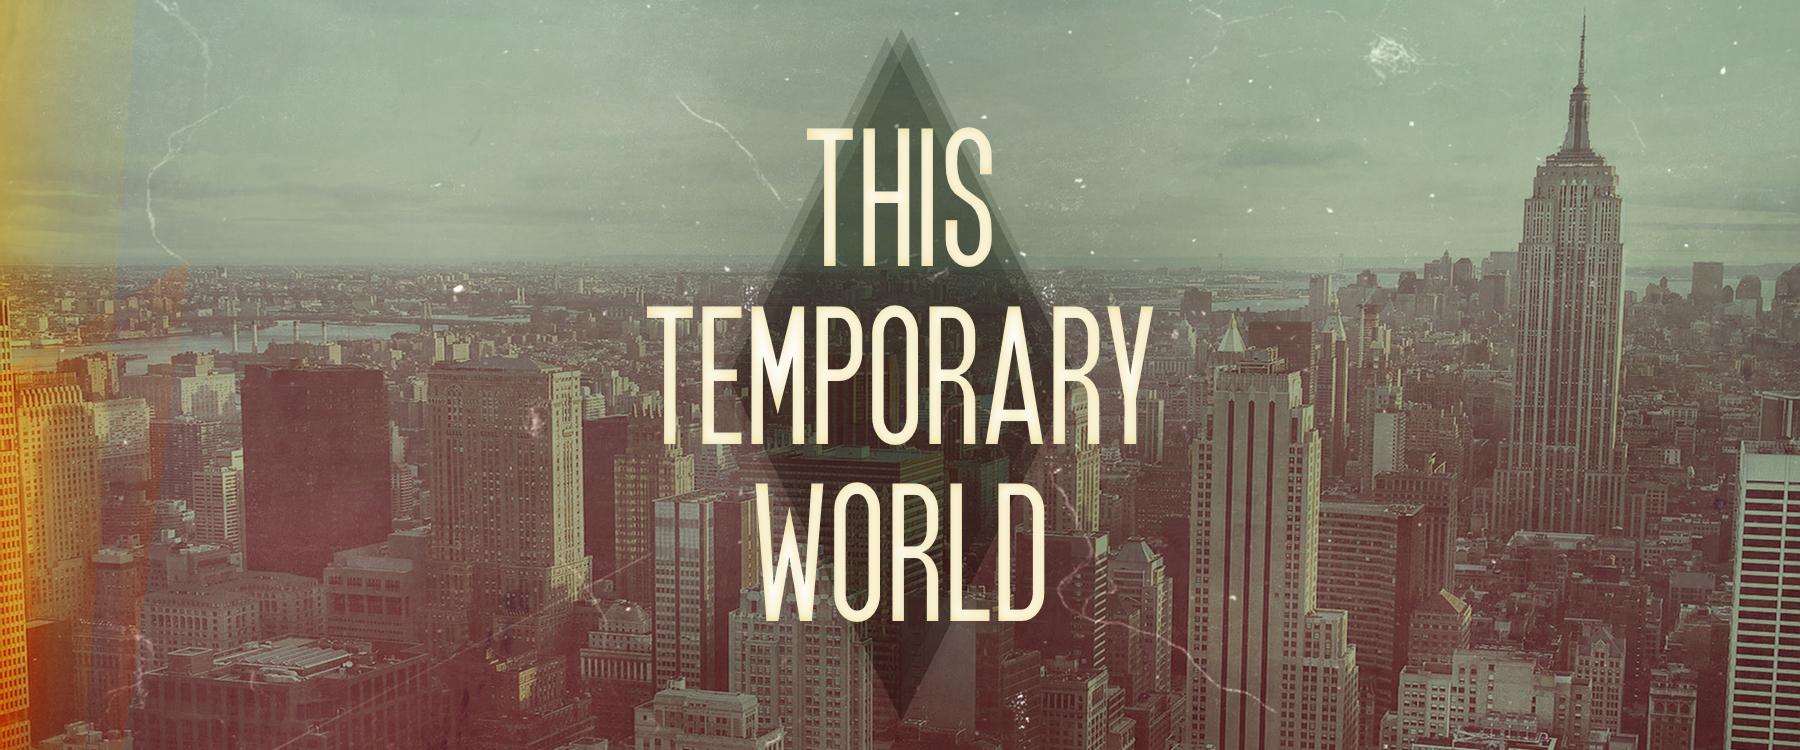 Temporary World SLIDER